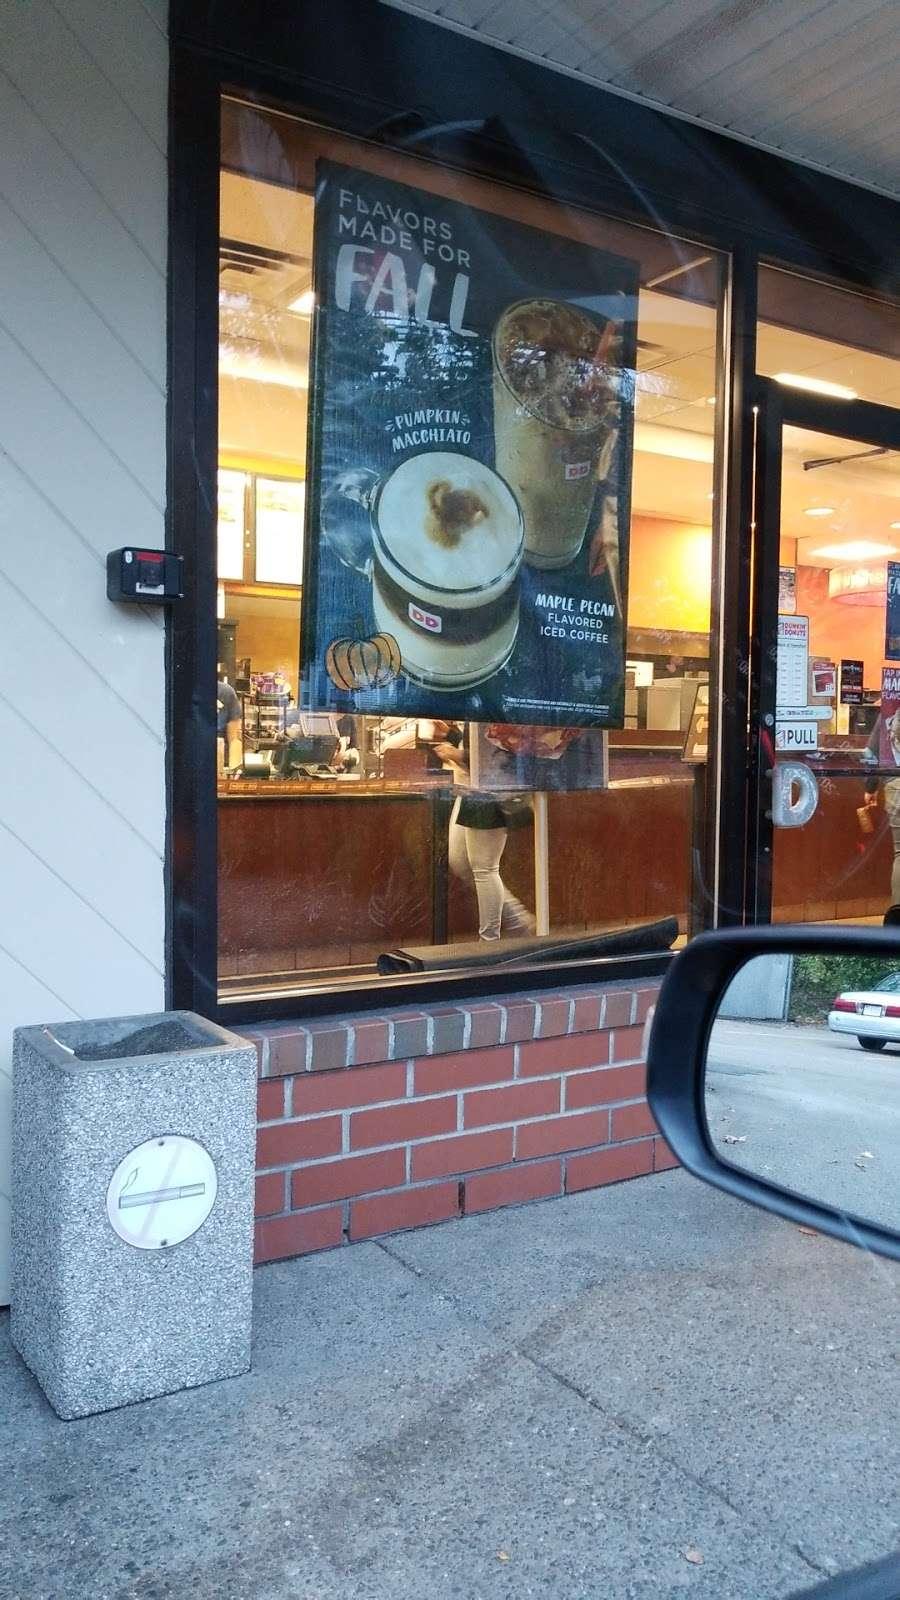 Dunkin - cafe  | Photo 2 of 10 | Address: 238 Grove St, Braintree, MA 02184, USA | Phone: (781) 849-0815